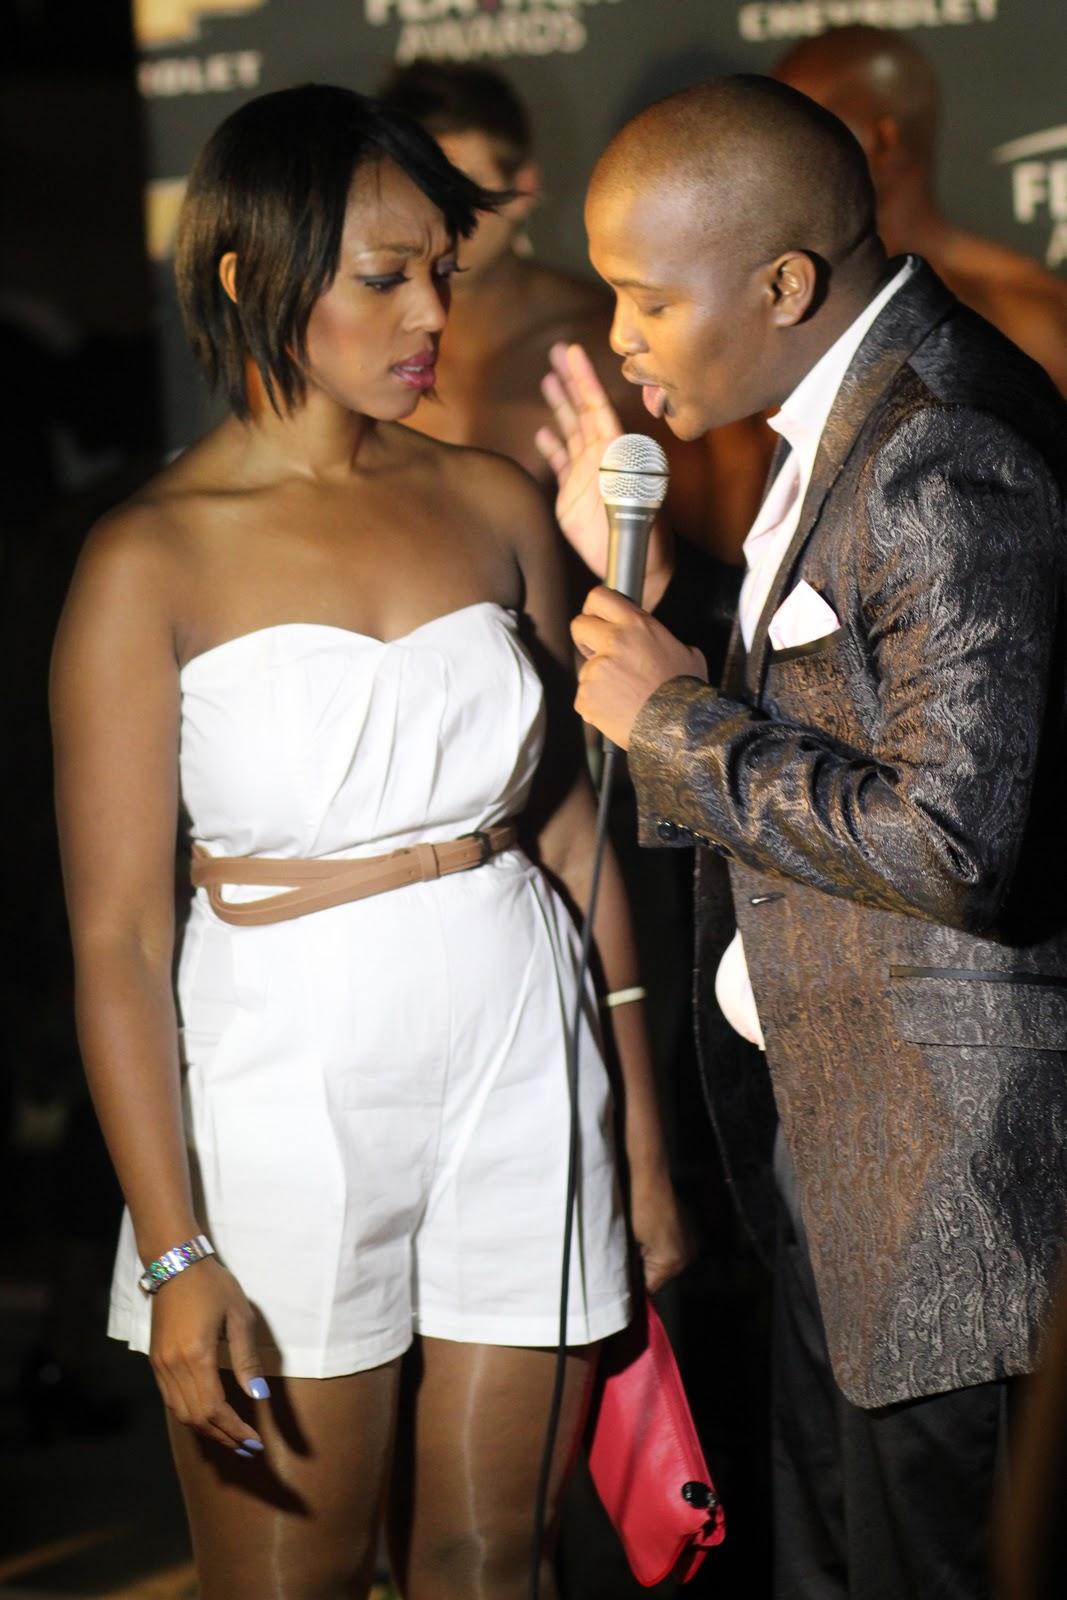 who is dating katlego danke in real life Katlego muvhango real name sindi dlathu married real life katlego danke generations: biography ,marriage ,husband by swag africa.